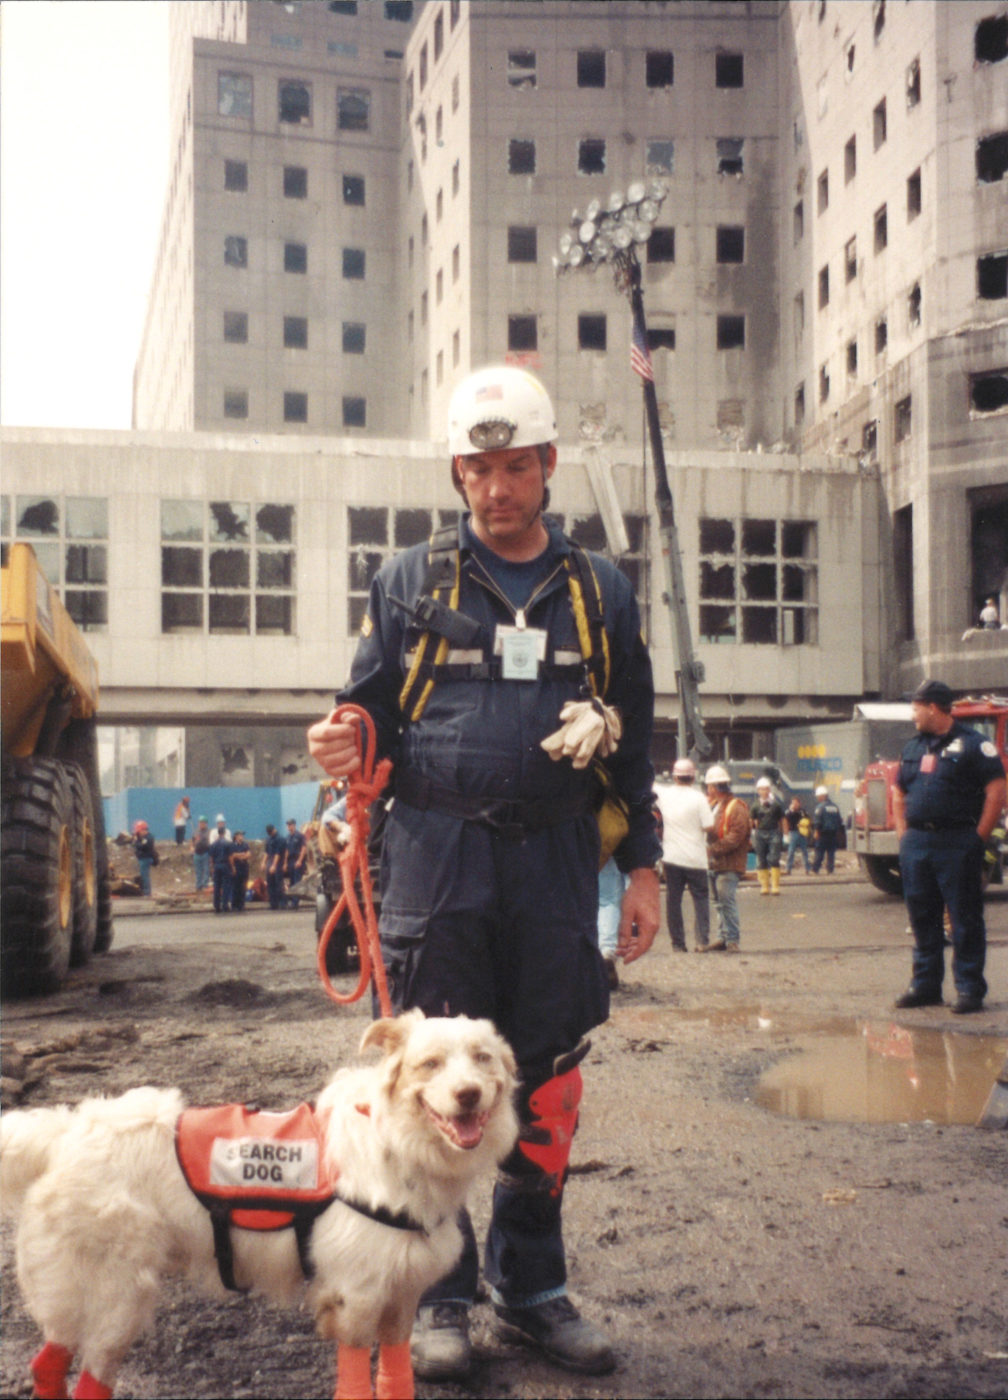 Handler and Rescue Dog at Ground Zero (2)